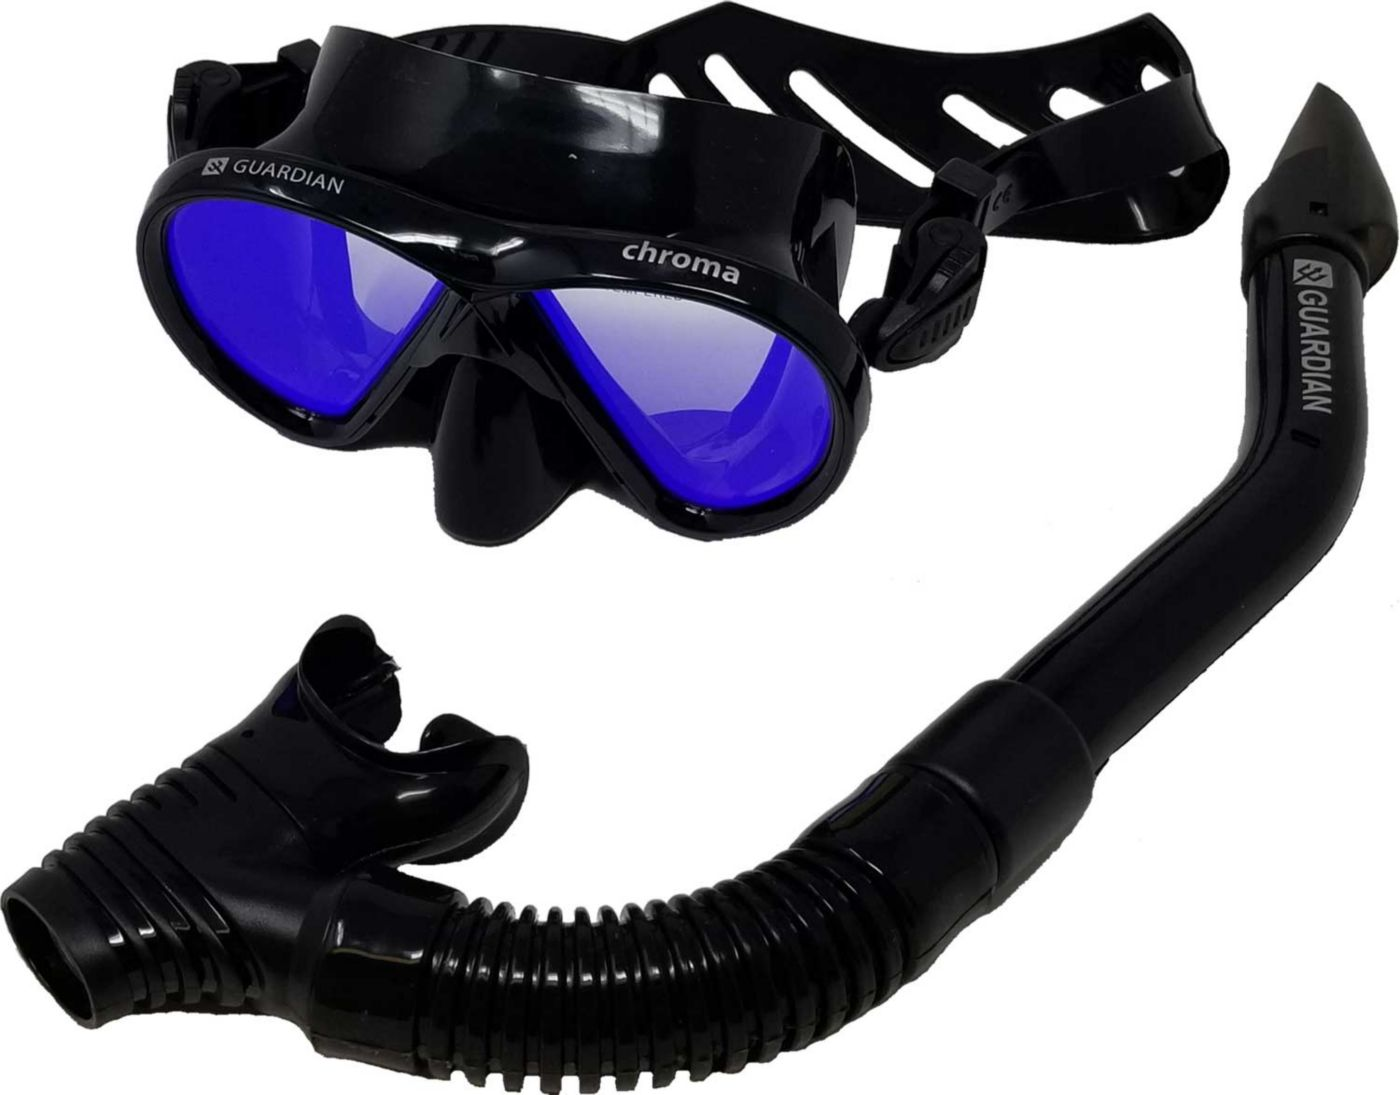 Guardian Chroma HD Mirrored Snorkeling Combo